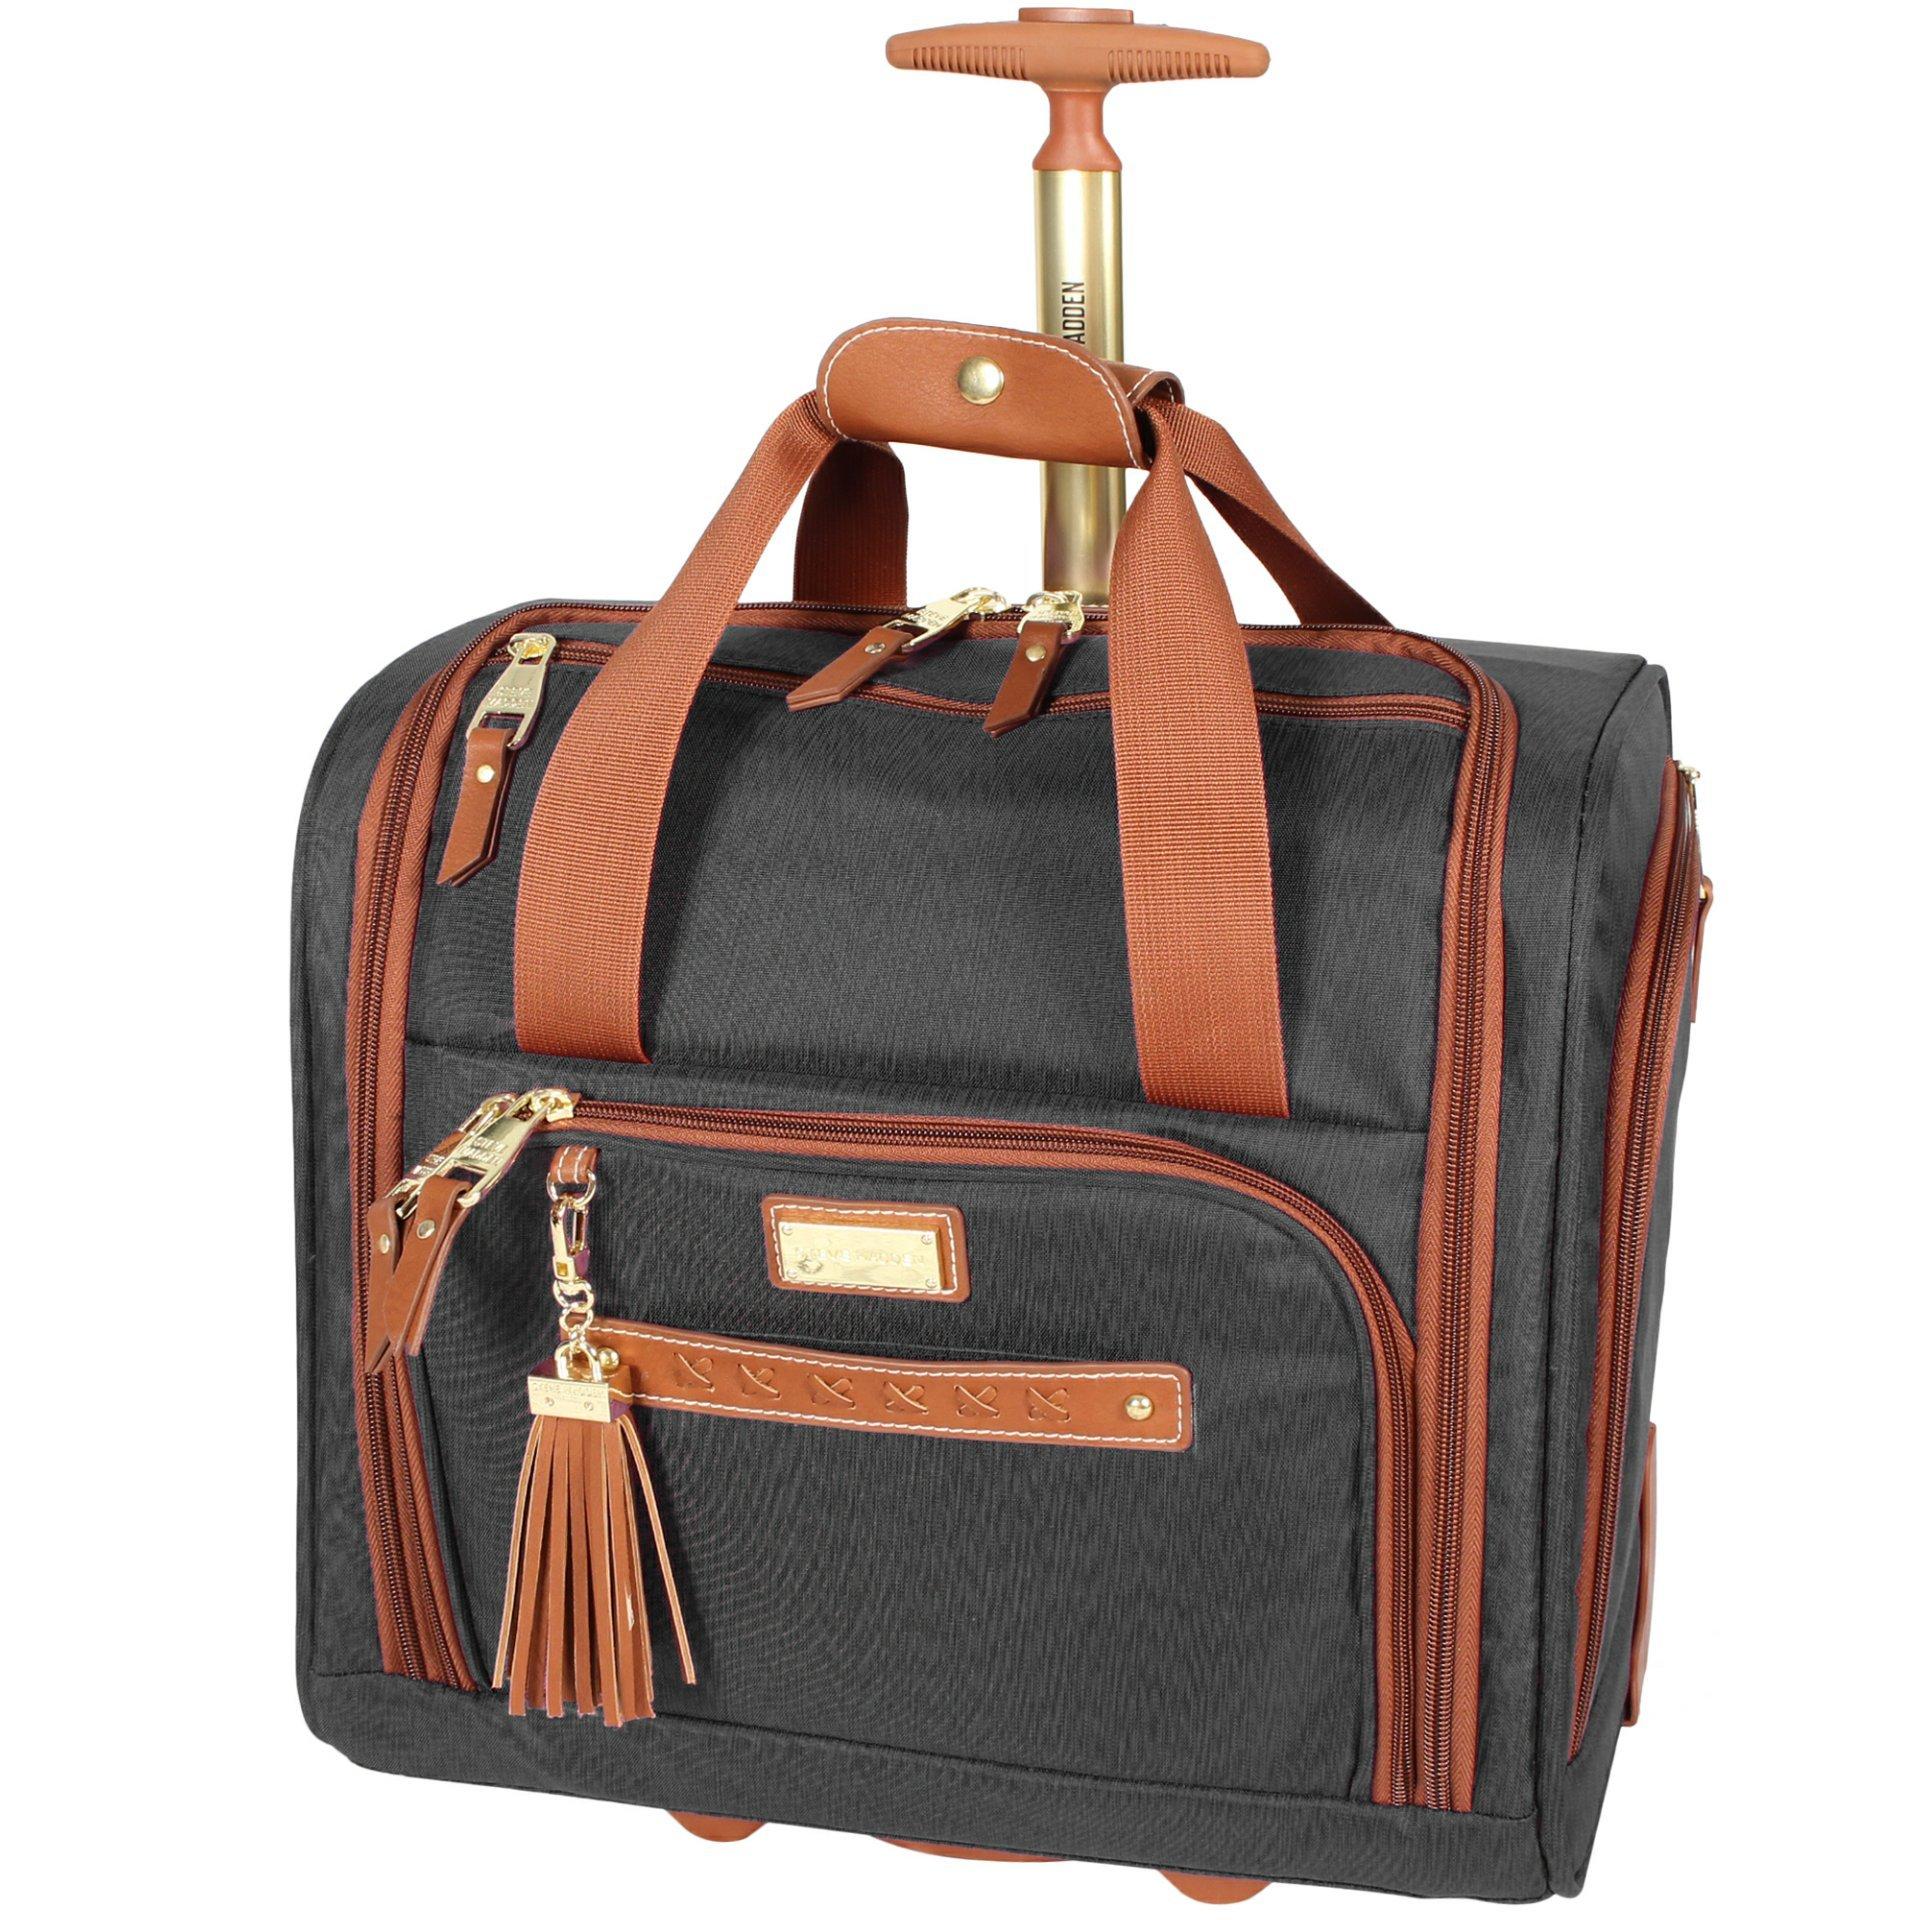 Steve Madden Global Wheeled Under Seat Bag (Black)